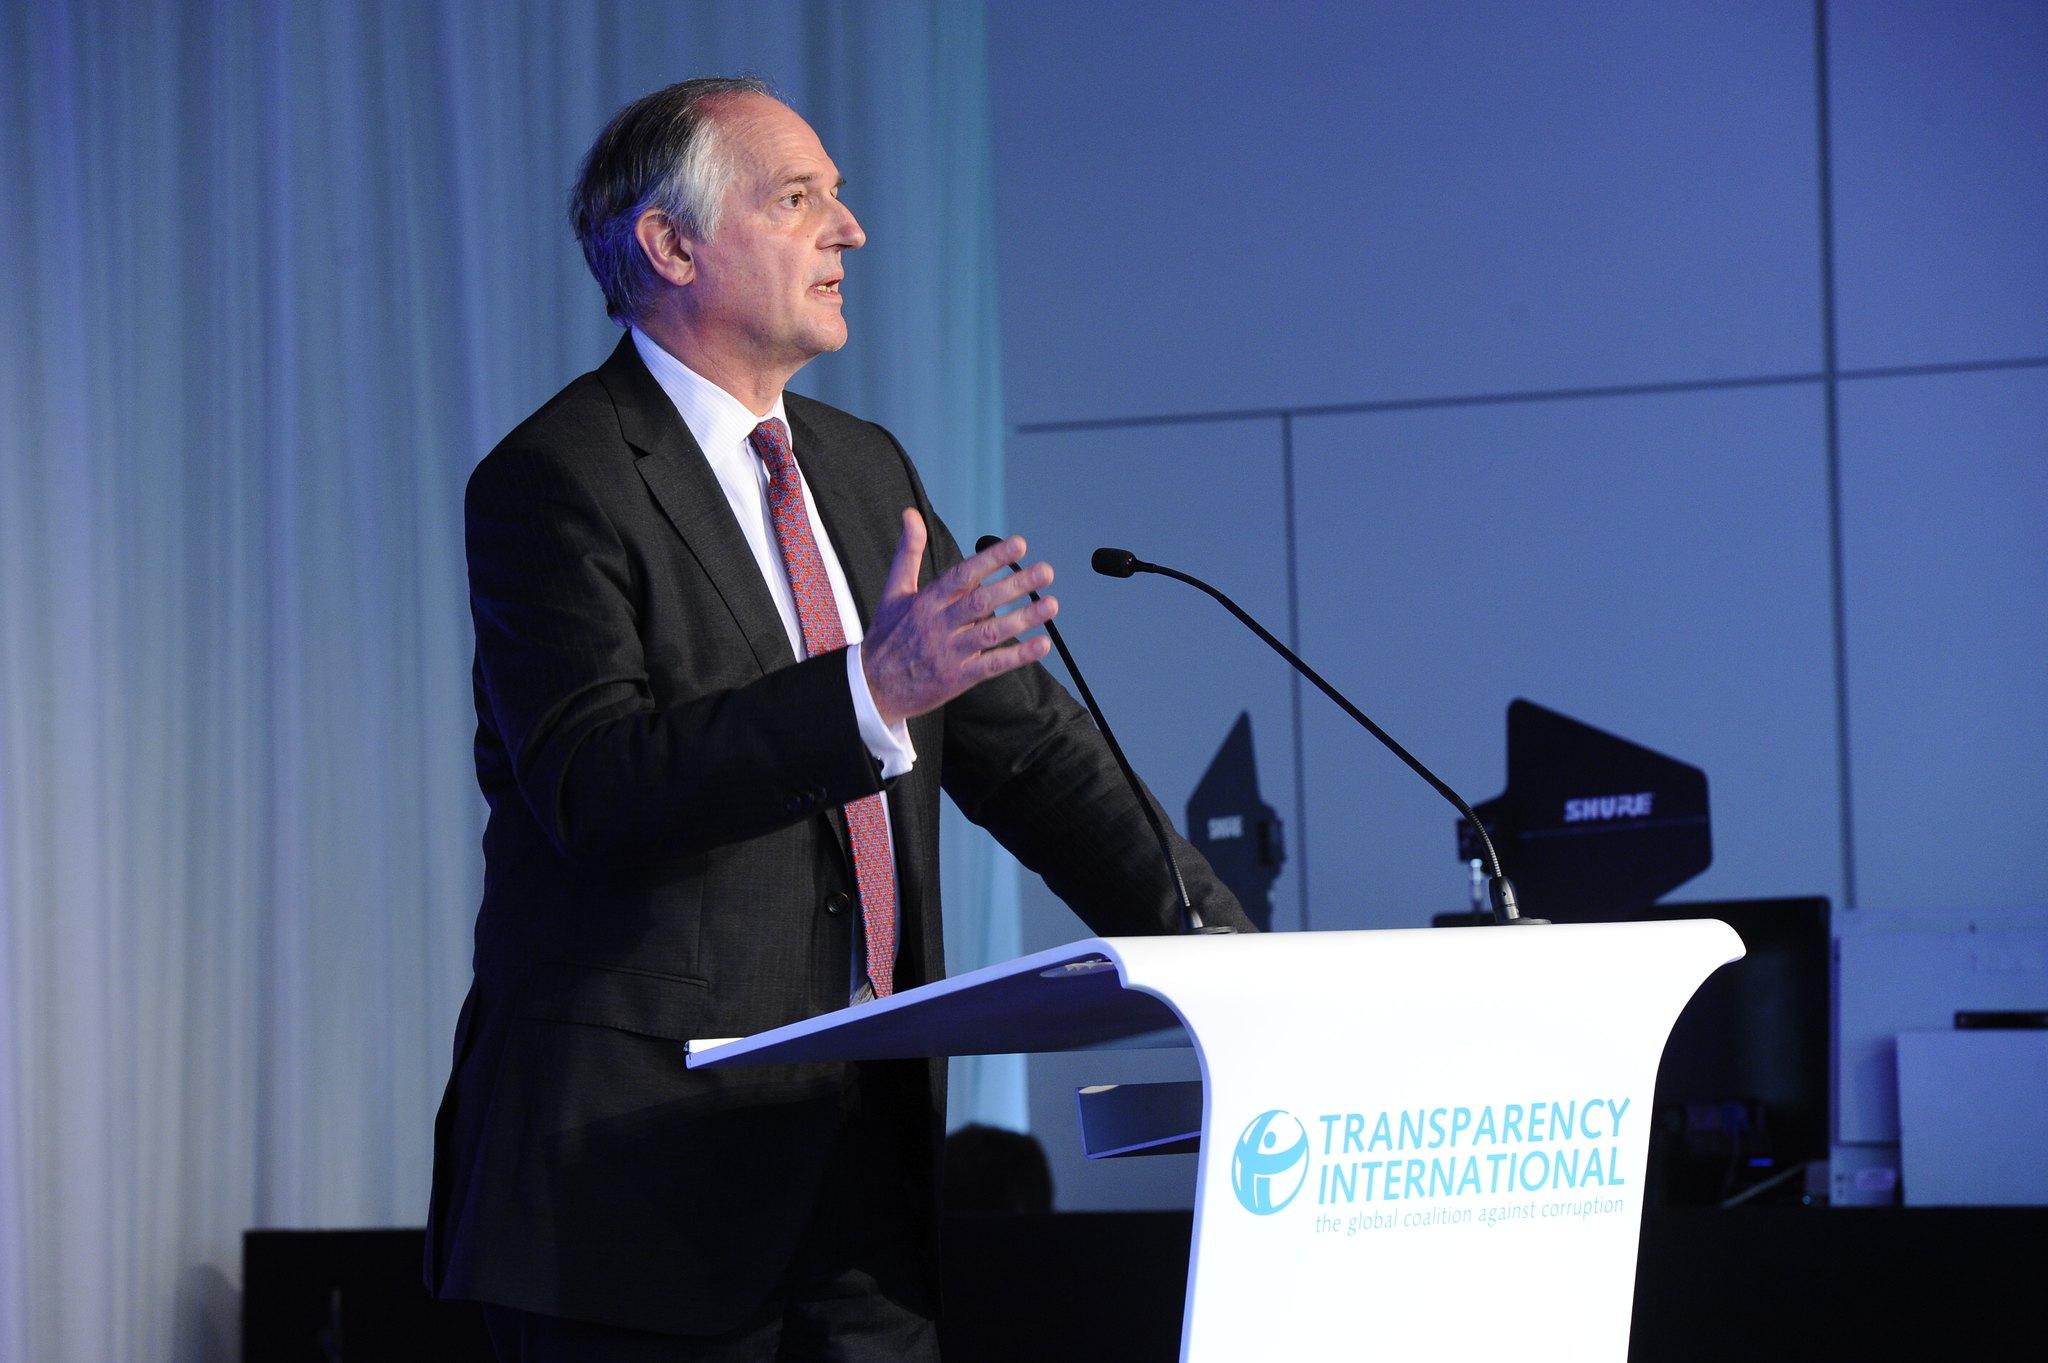 NRC: Unilever-baas Polman had het grote geld onderschat